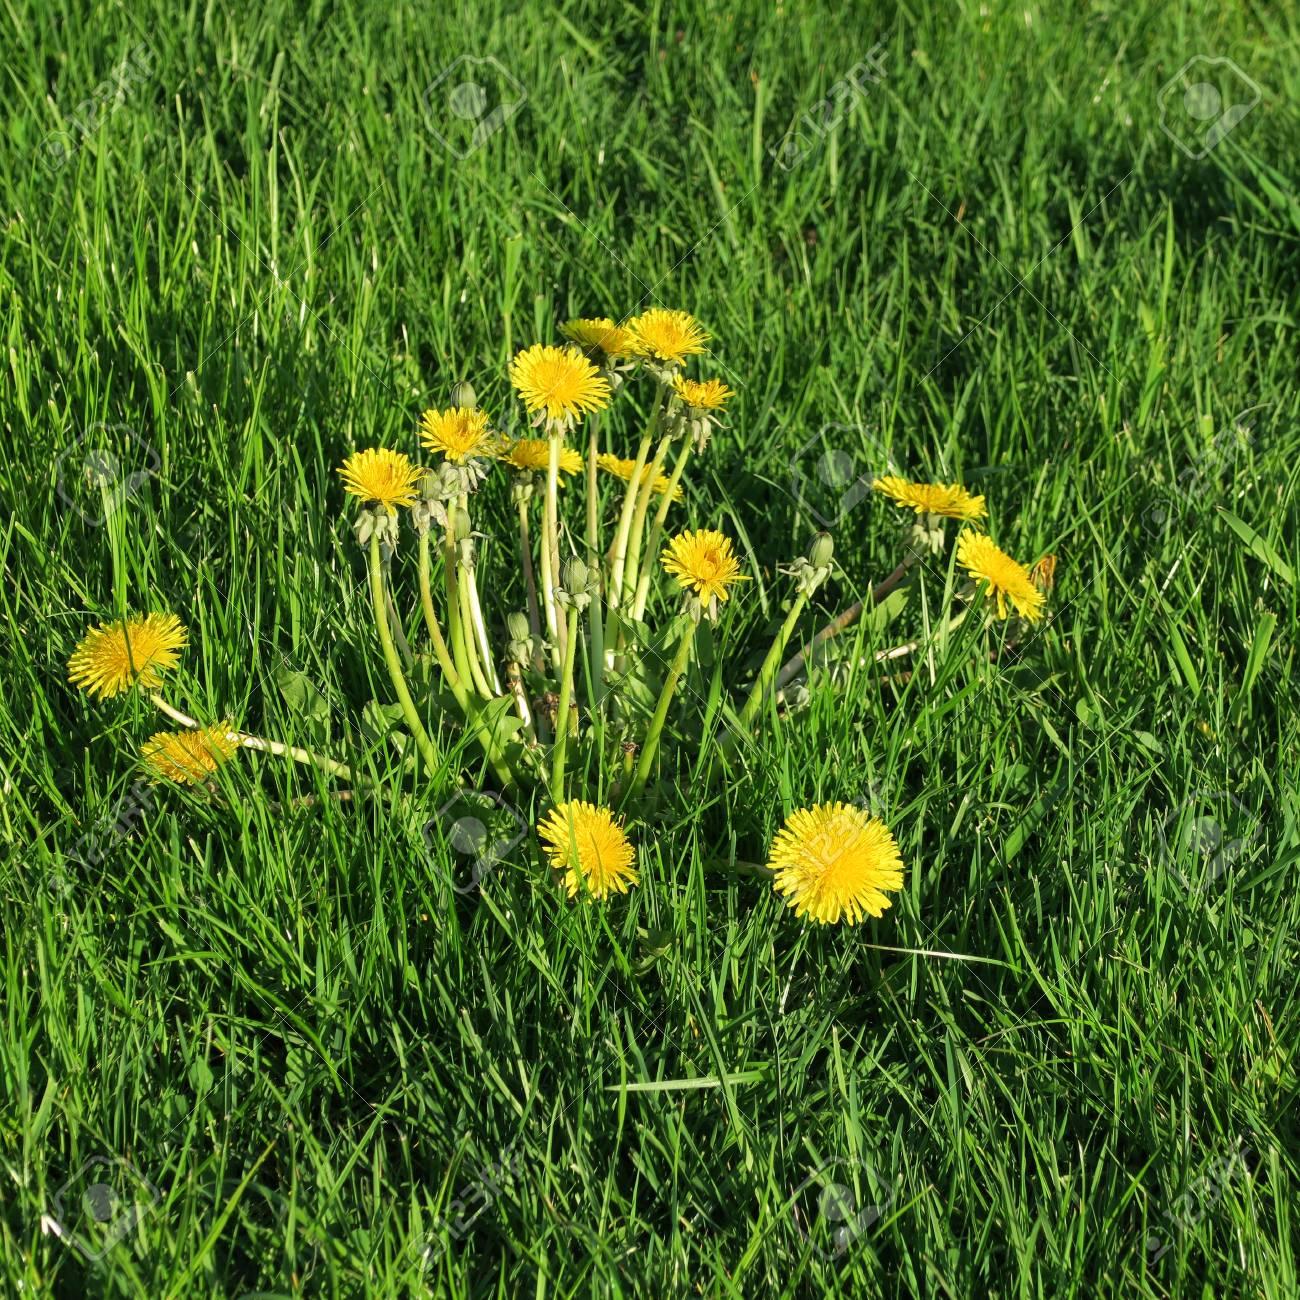 Taraxacum Sect Ruderalia Yellow Flowering Plant Butter Flower